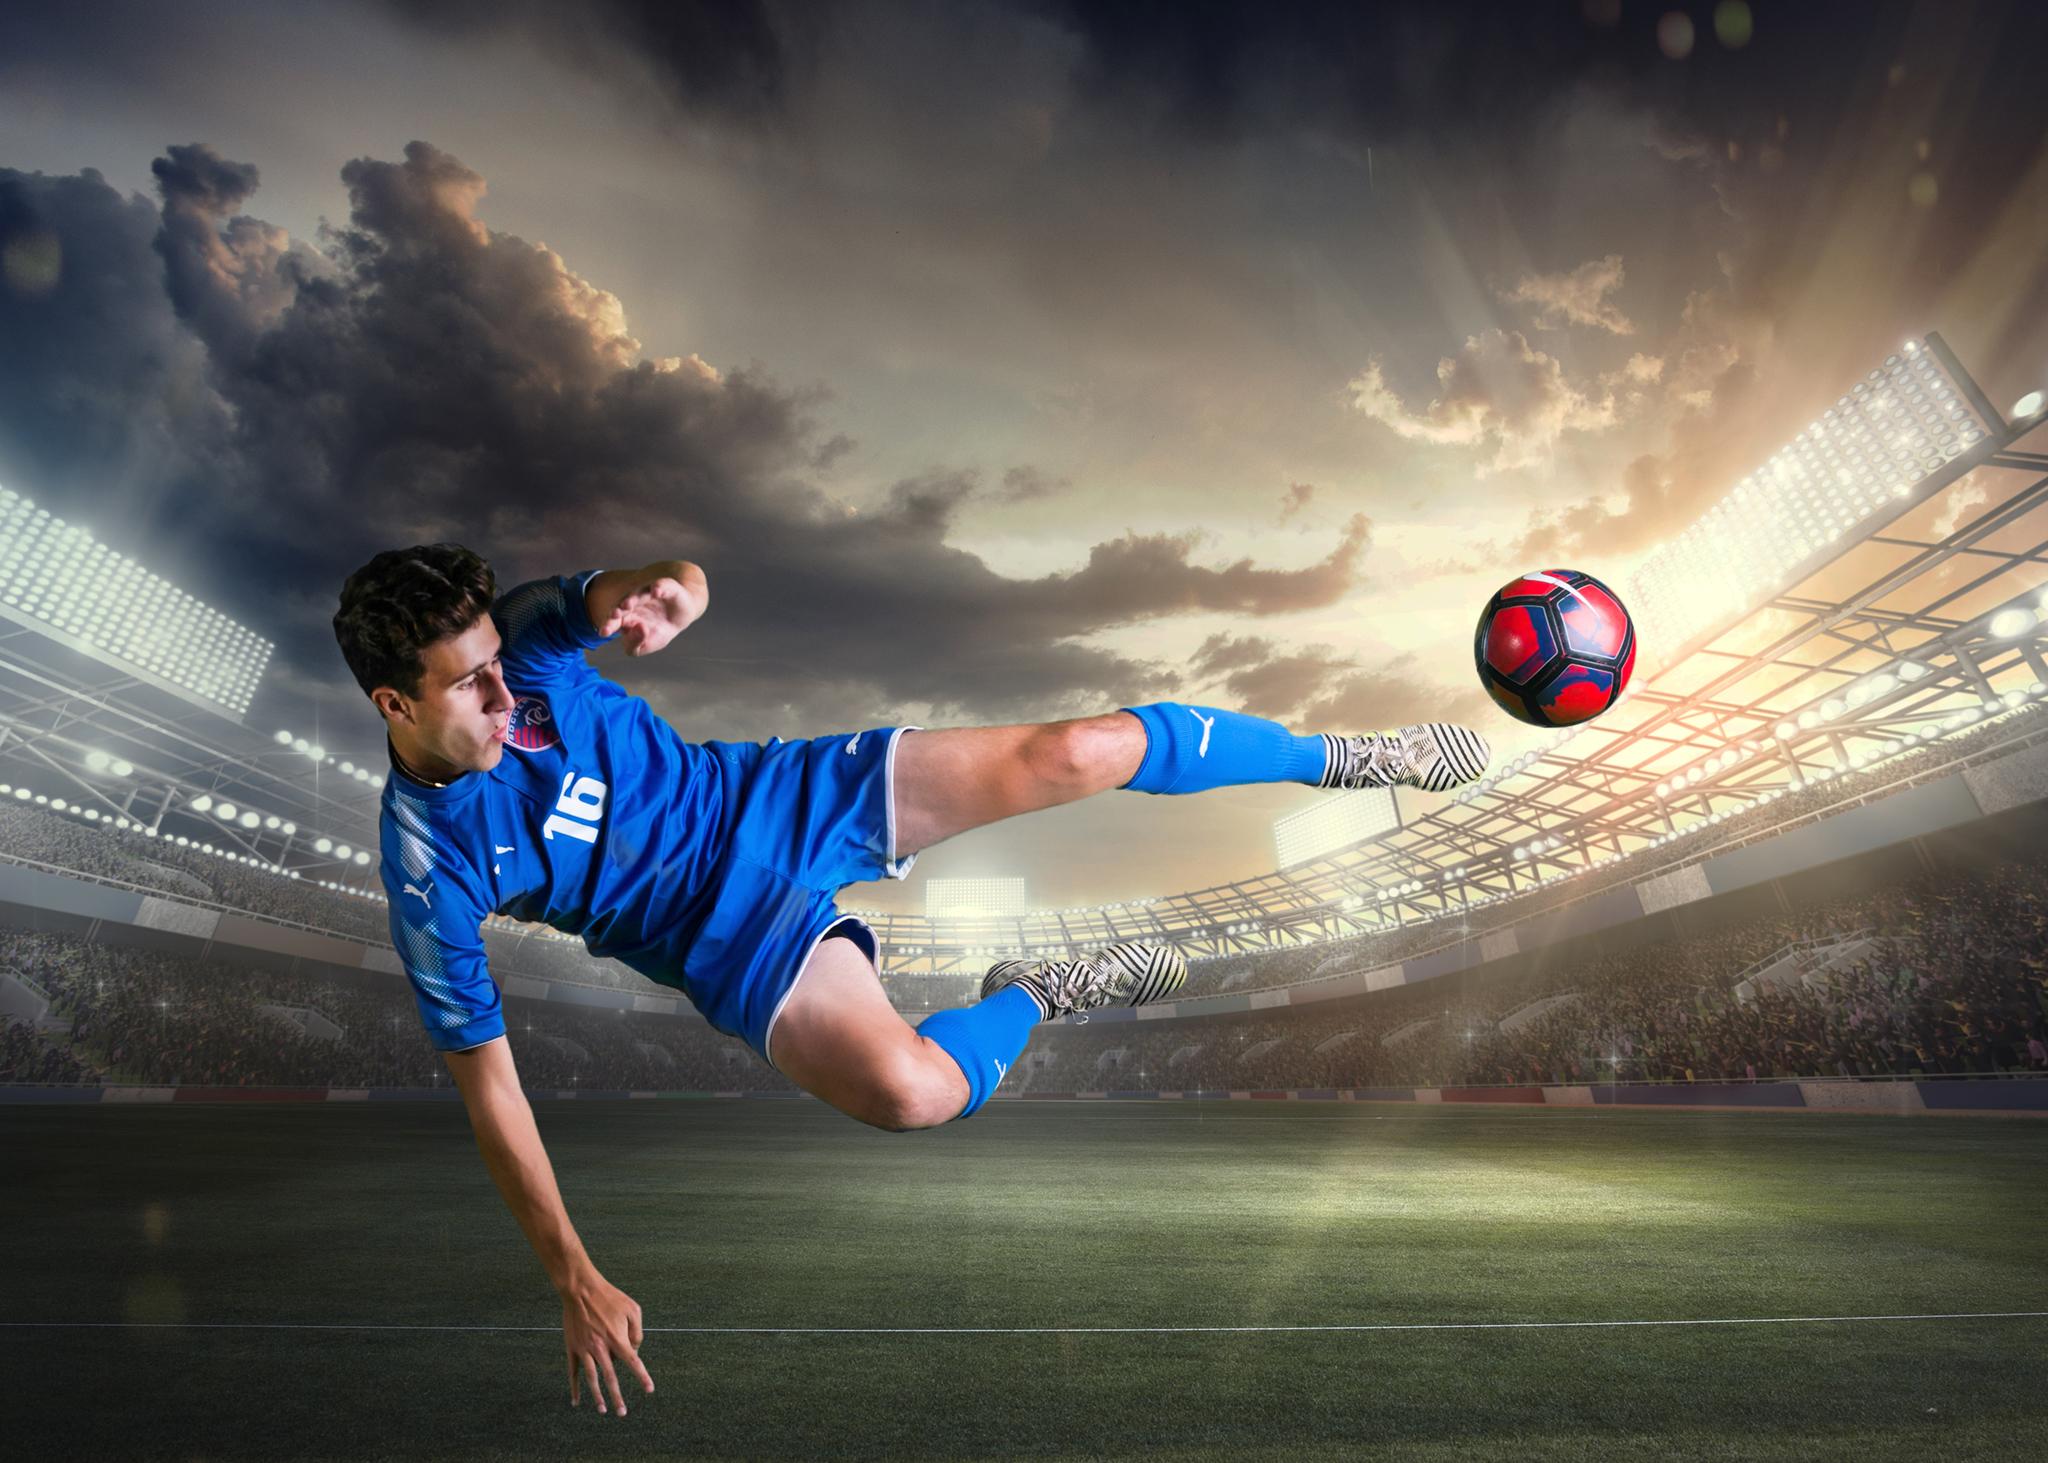 juian soccer RMP_2840 comp final sm.jpg